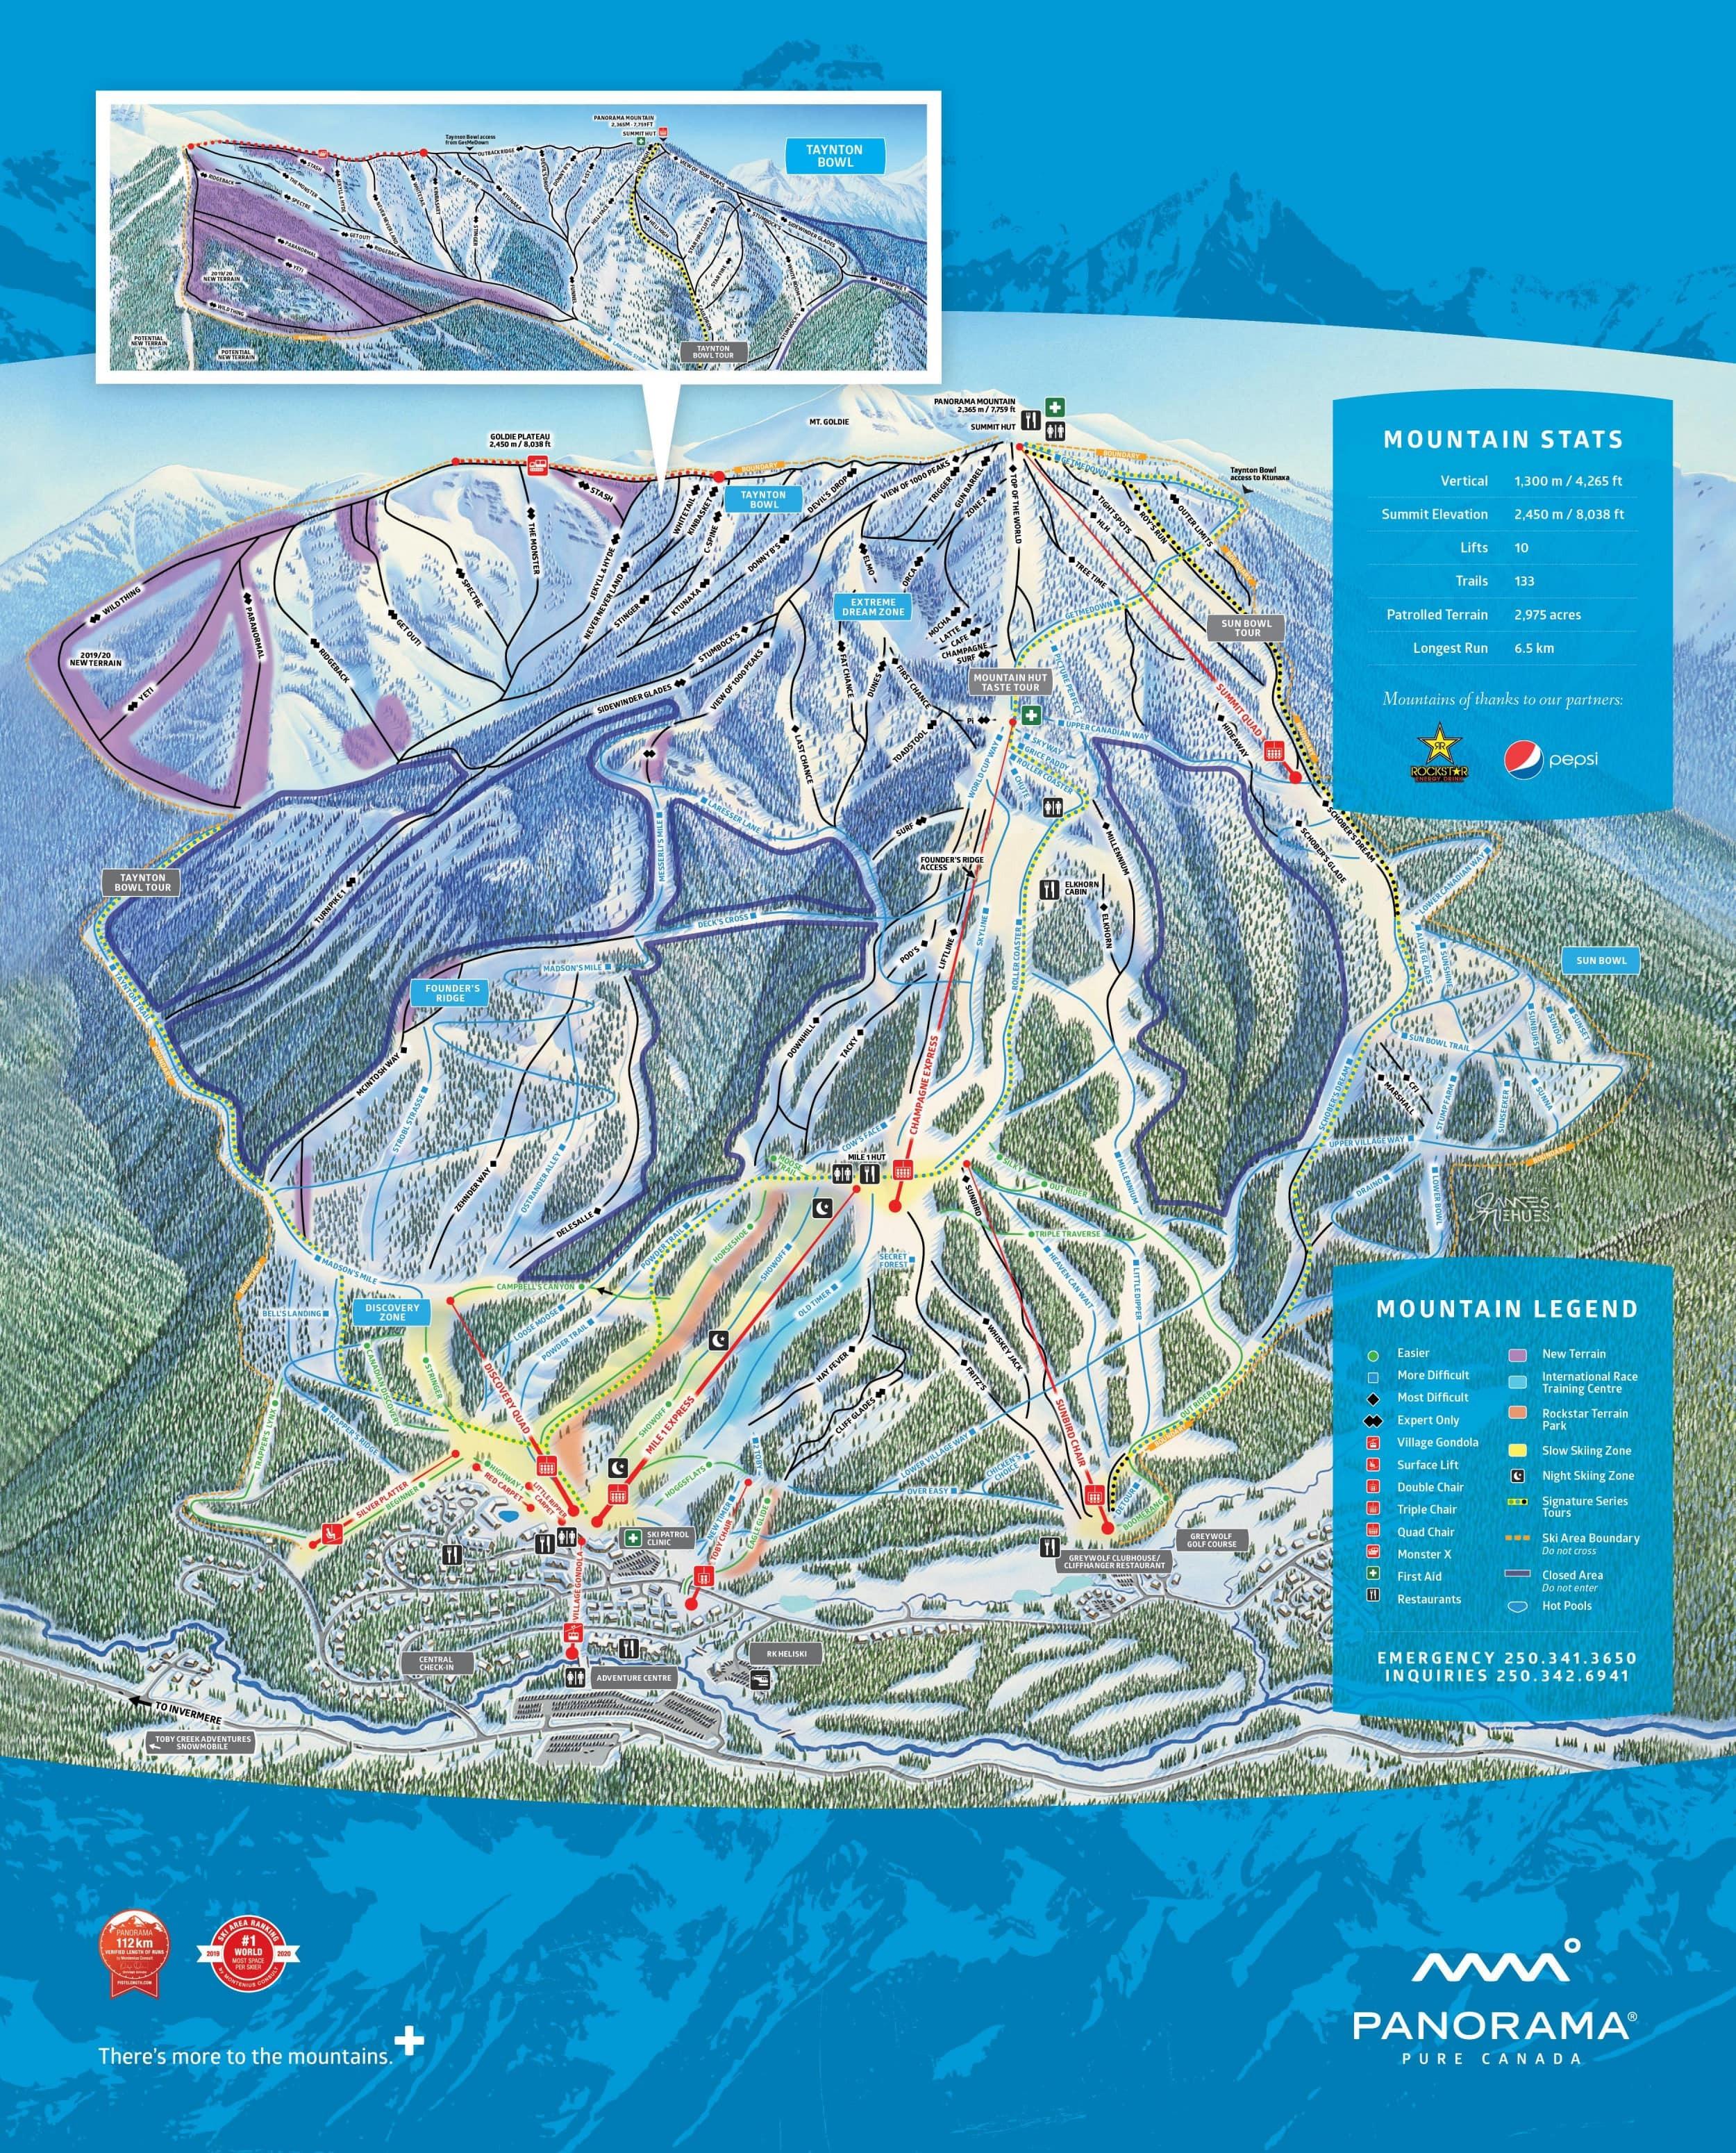 Panorama Mountain Resort Ski Resort Guide Location Map